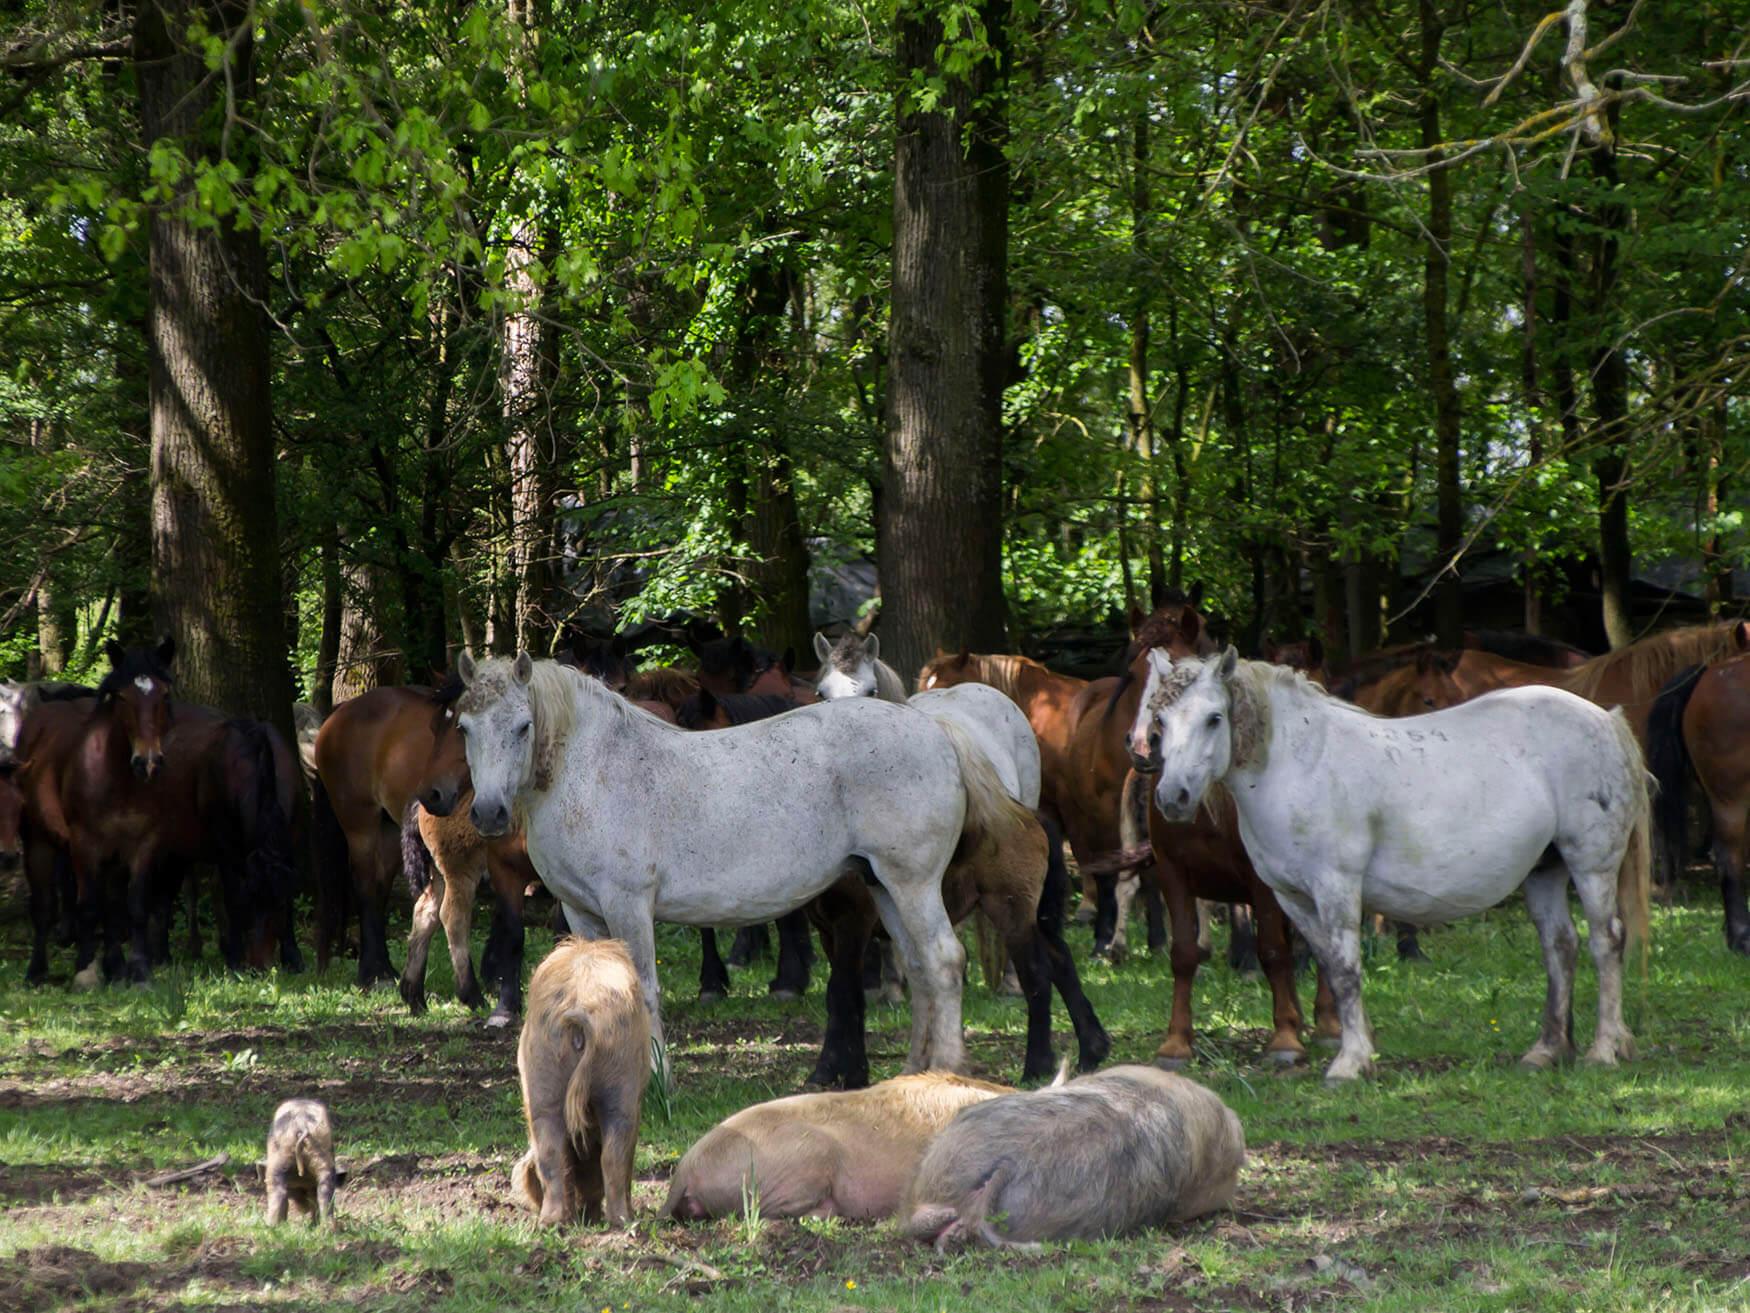 Željko_Orlić_Mužilovčica_Horses